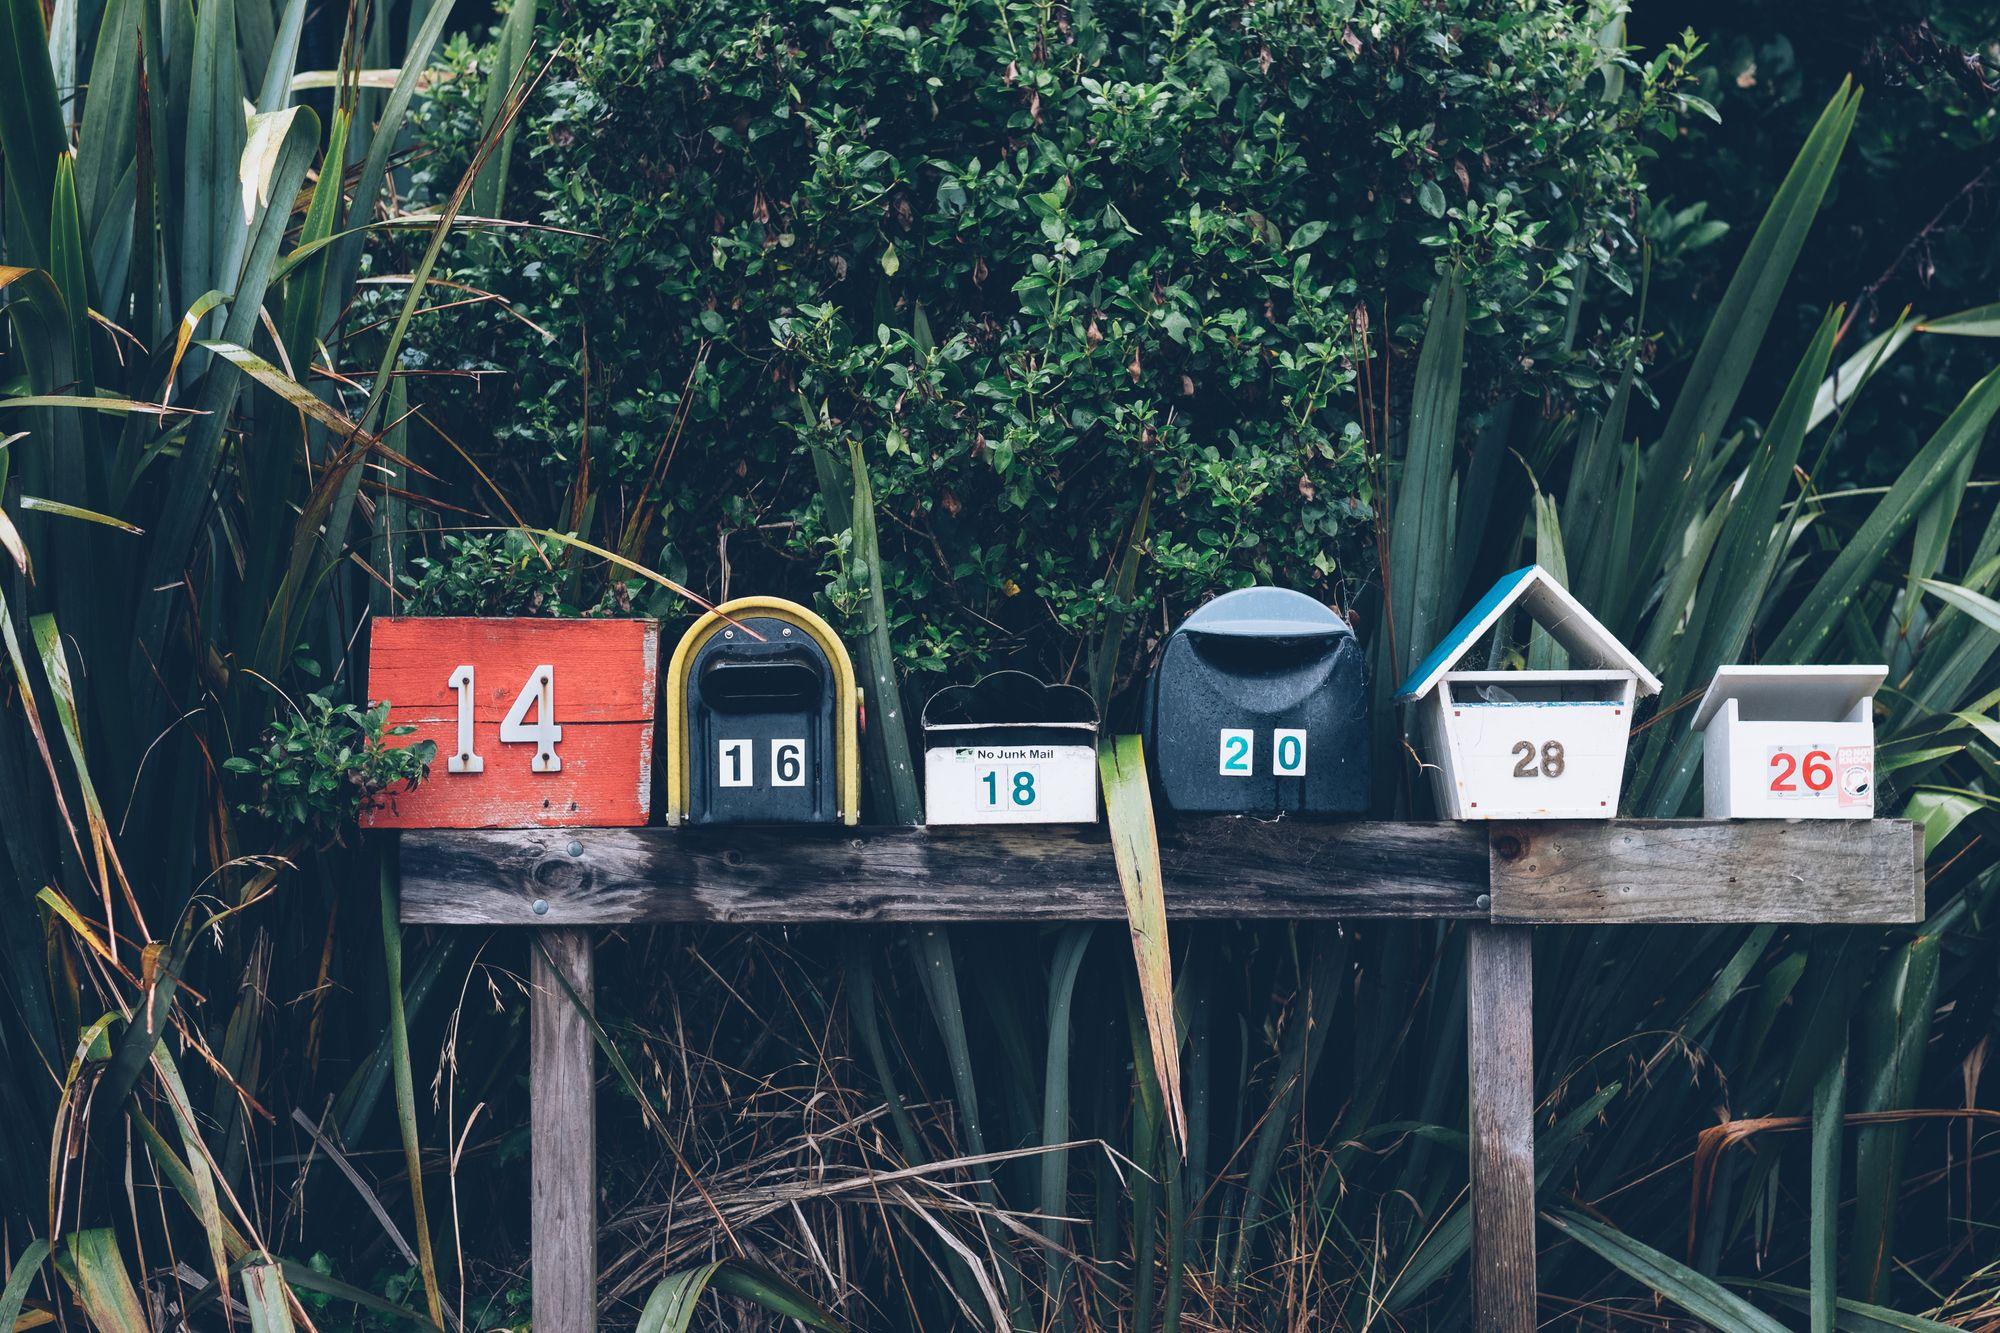 sender reciever mailbox encryption